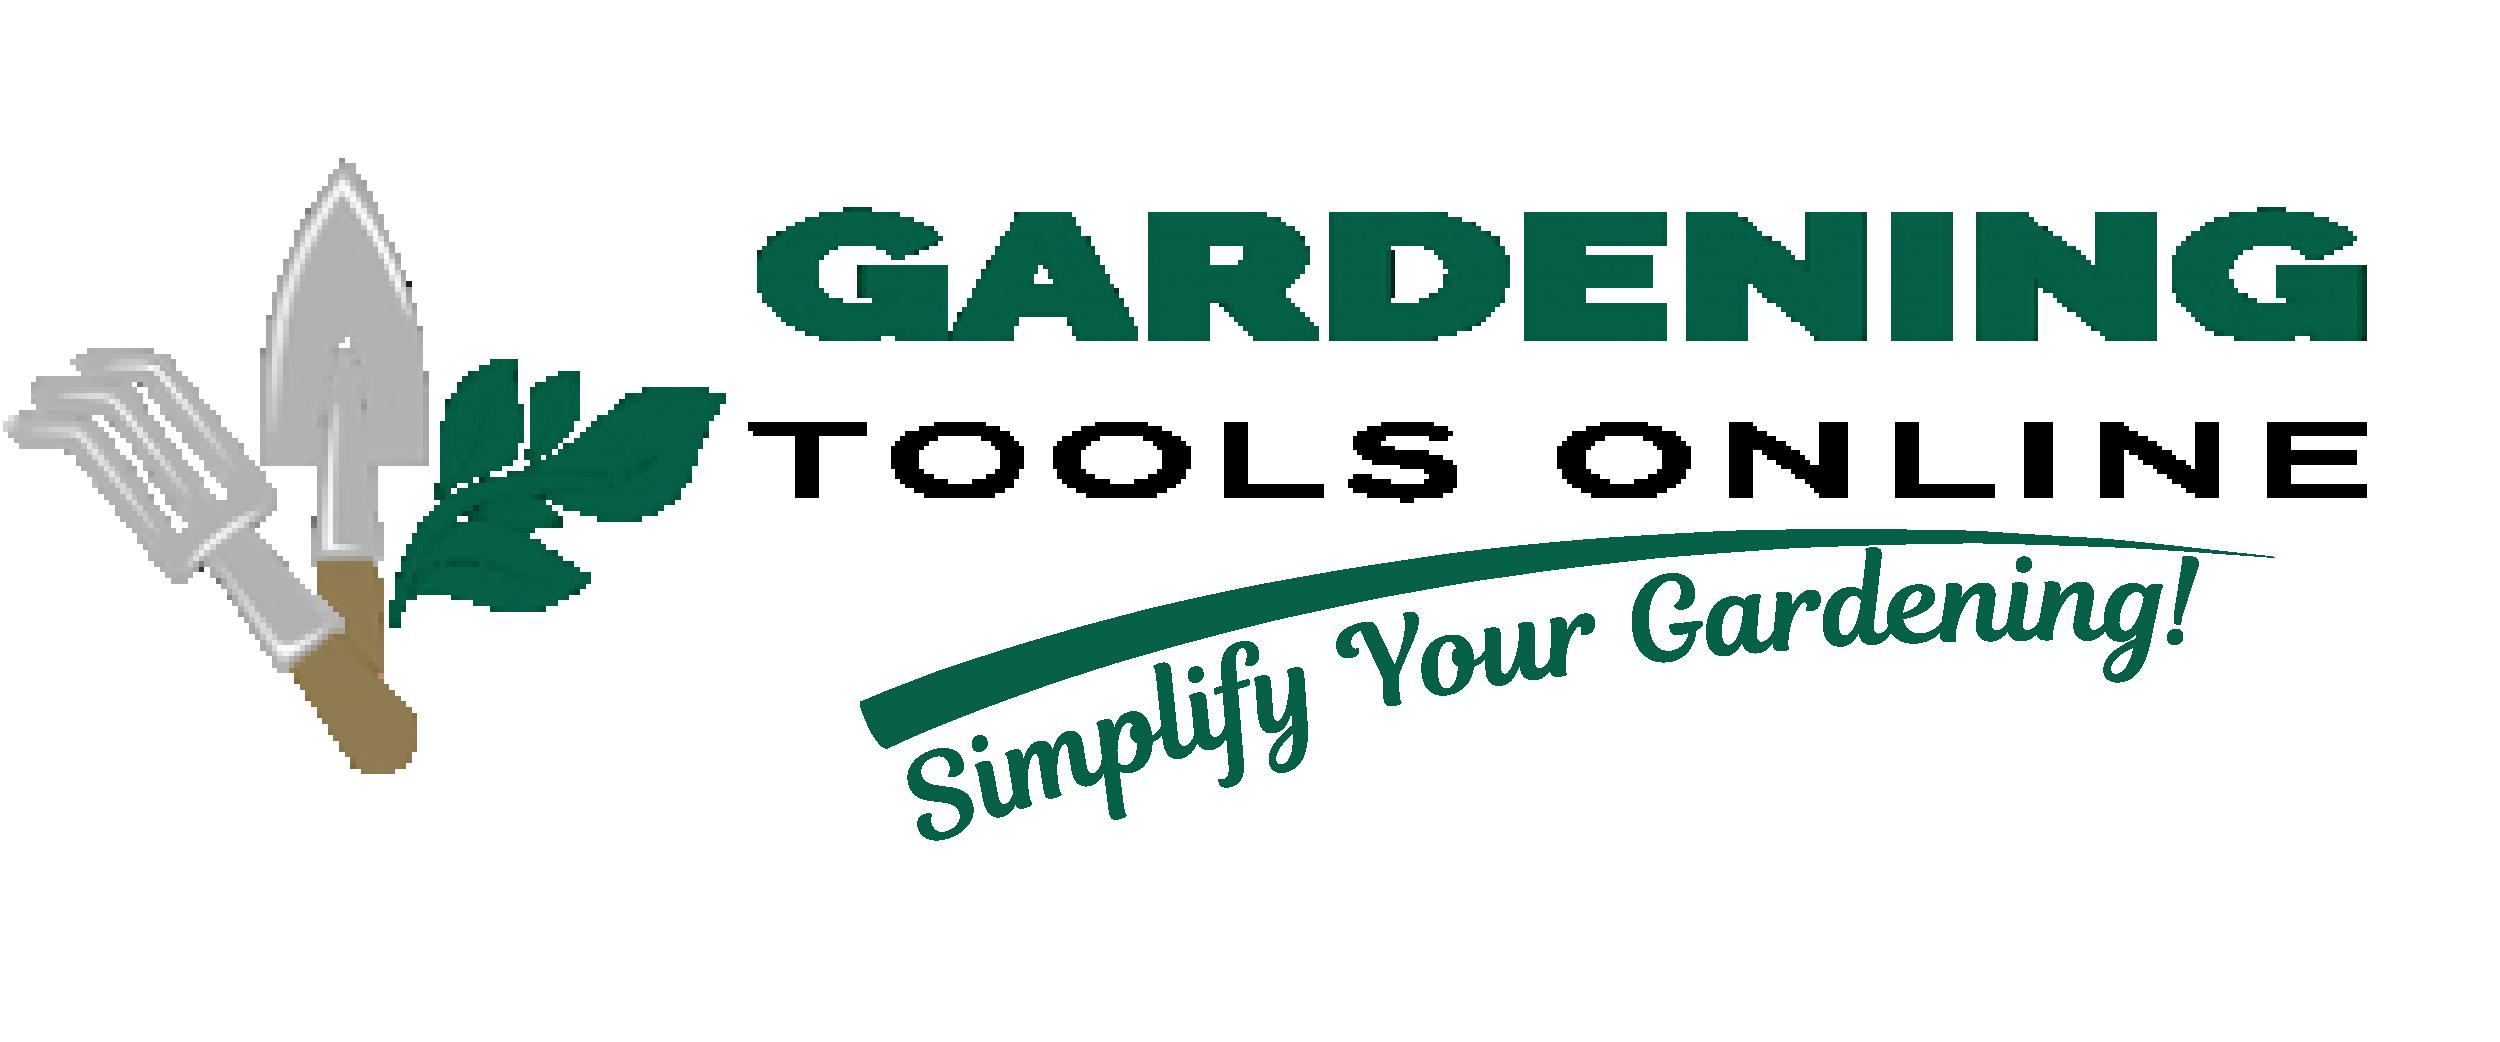 Gardeningtoolsonline